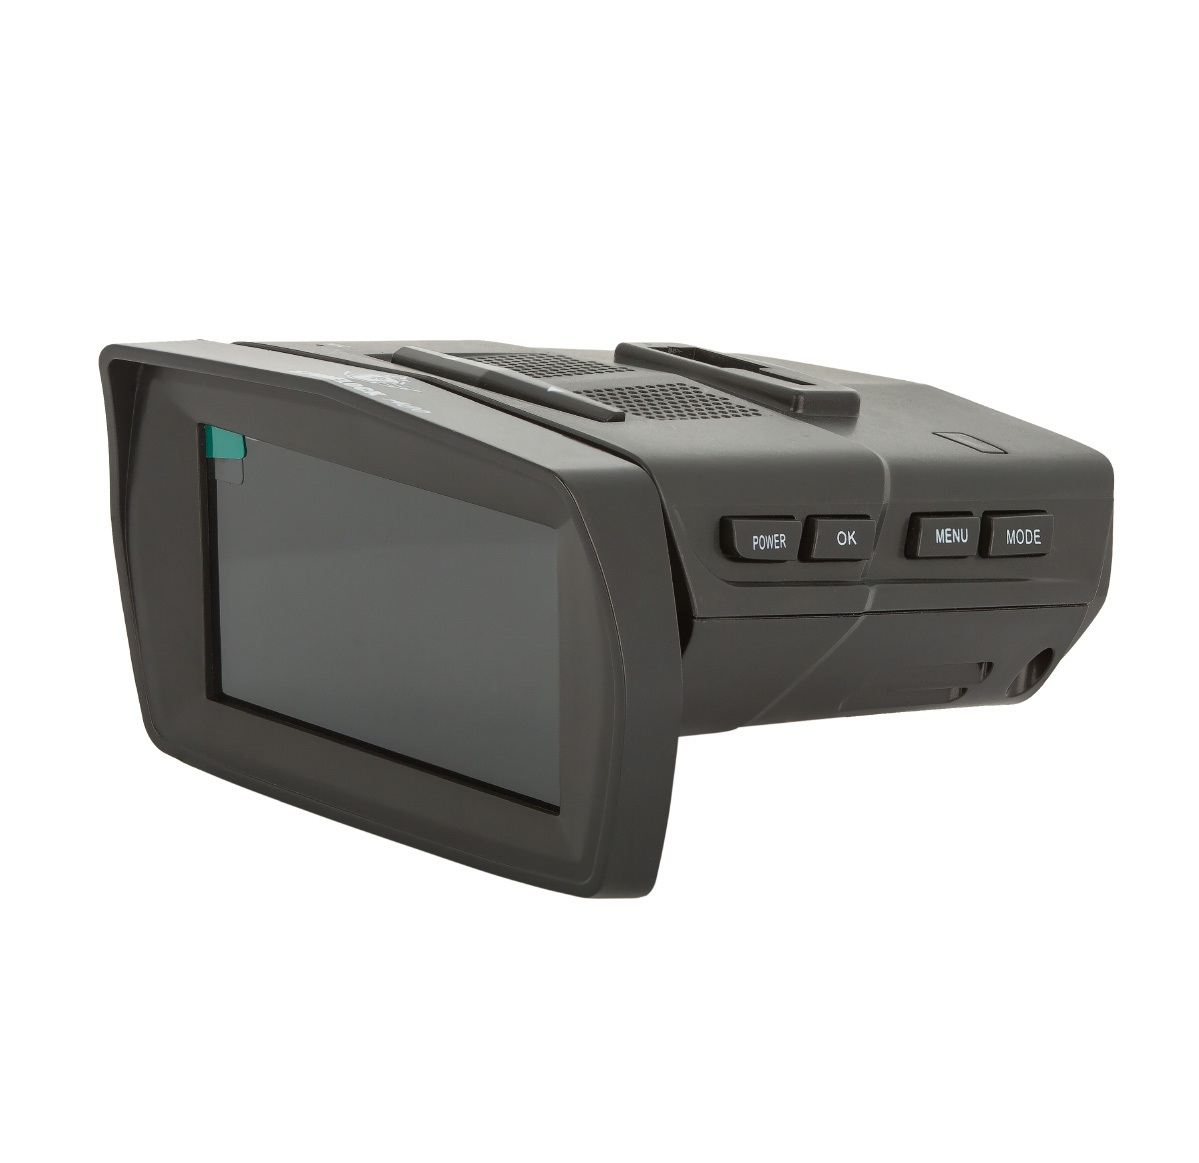 Видеорегистратор с радар-детектором Subini Stonelock Aco (+ Антисептик-спрей для рук в подарок!)